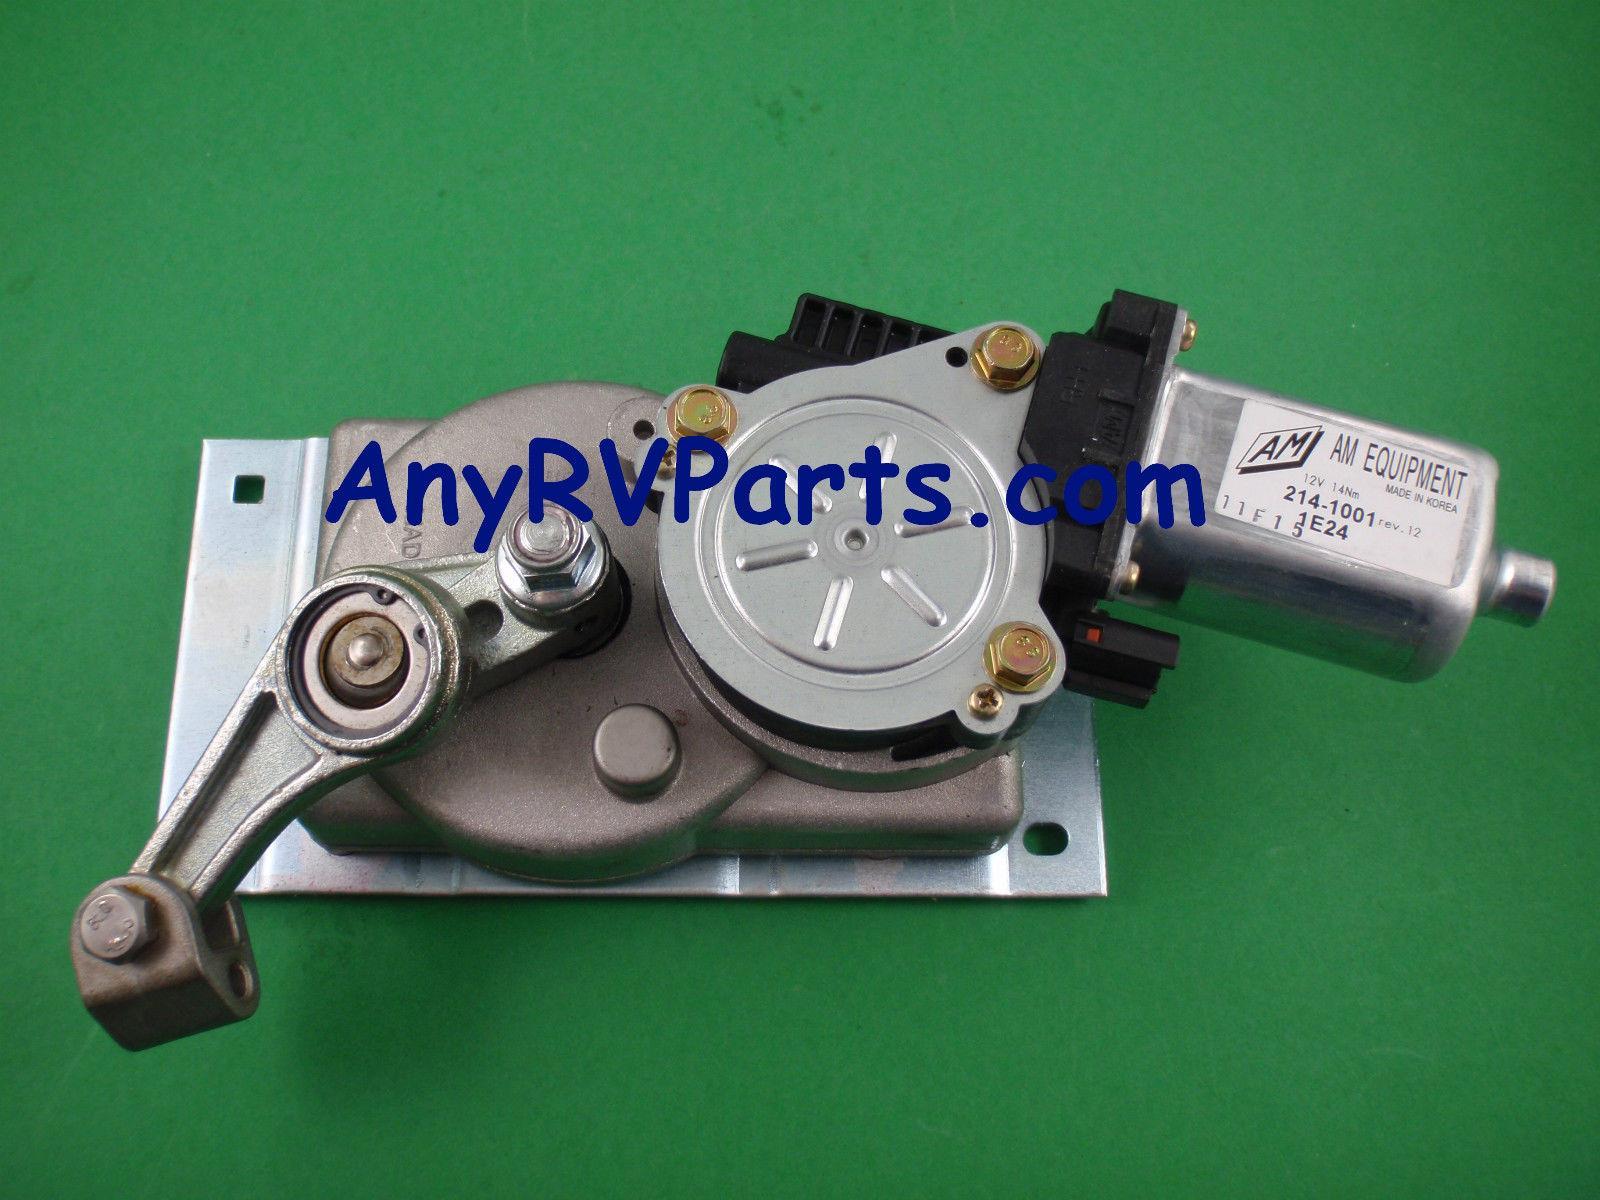 Kwikee power gear lippert 909772000 rv entry step motor for Motorized rv entry steps